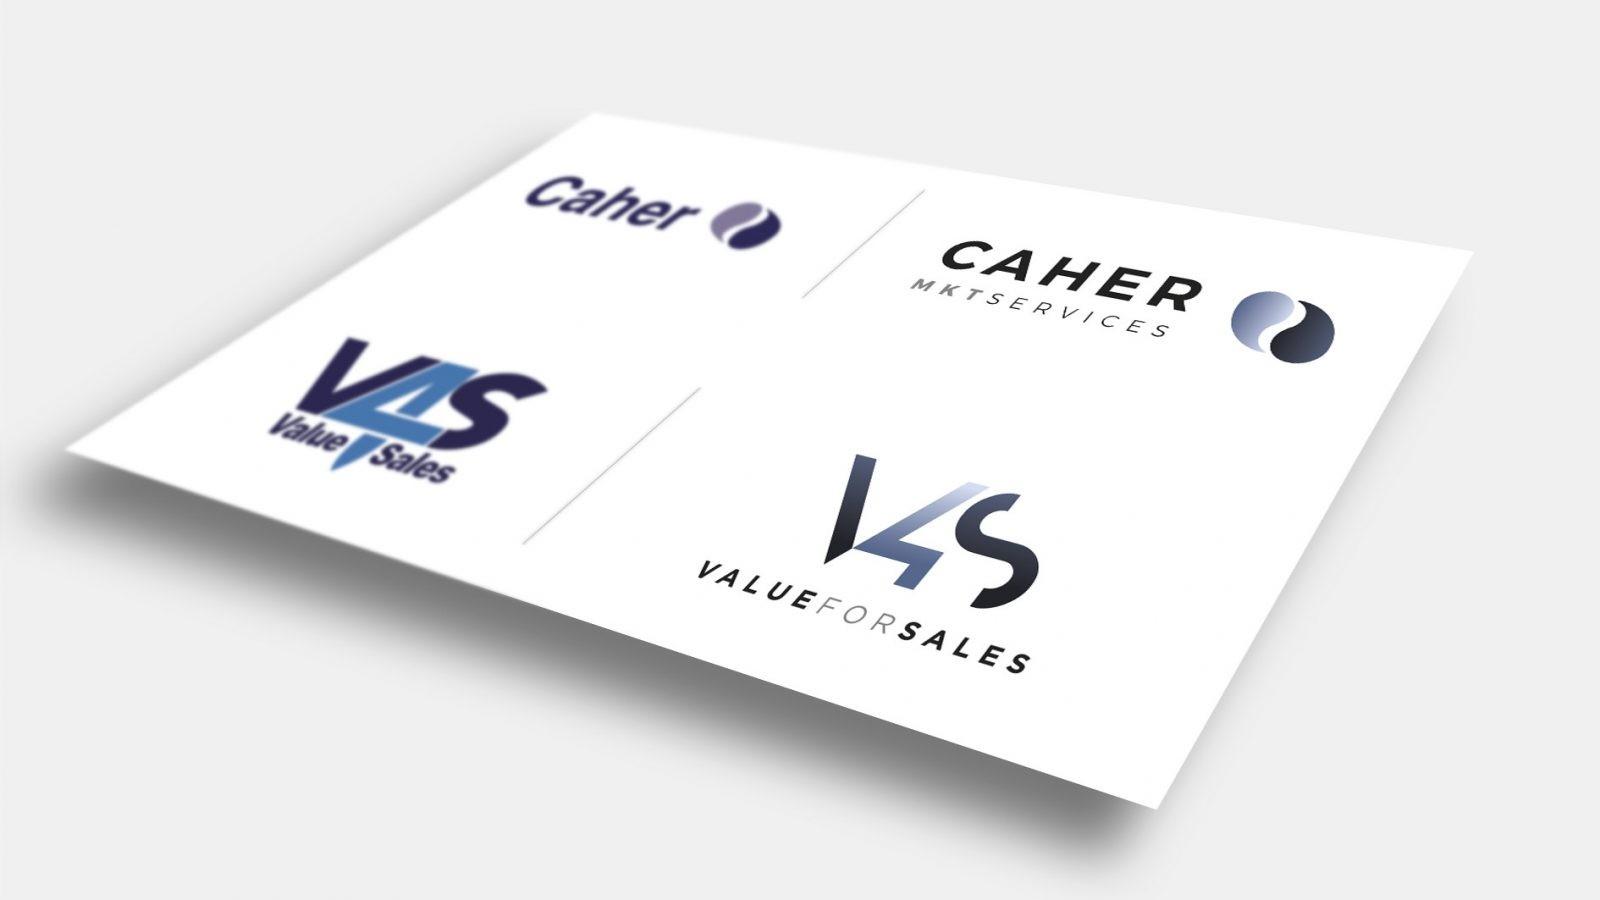 rebranding caher v4s